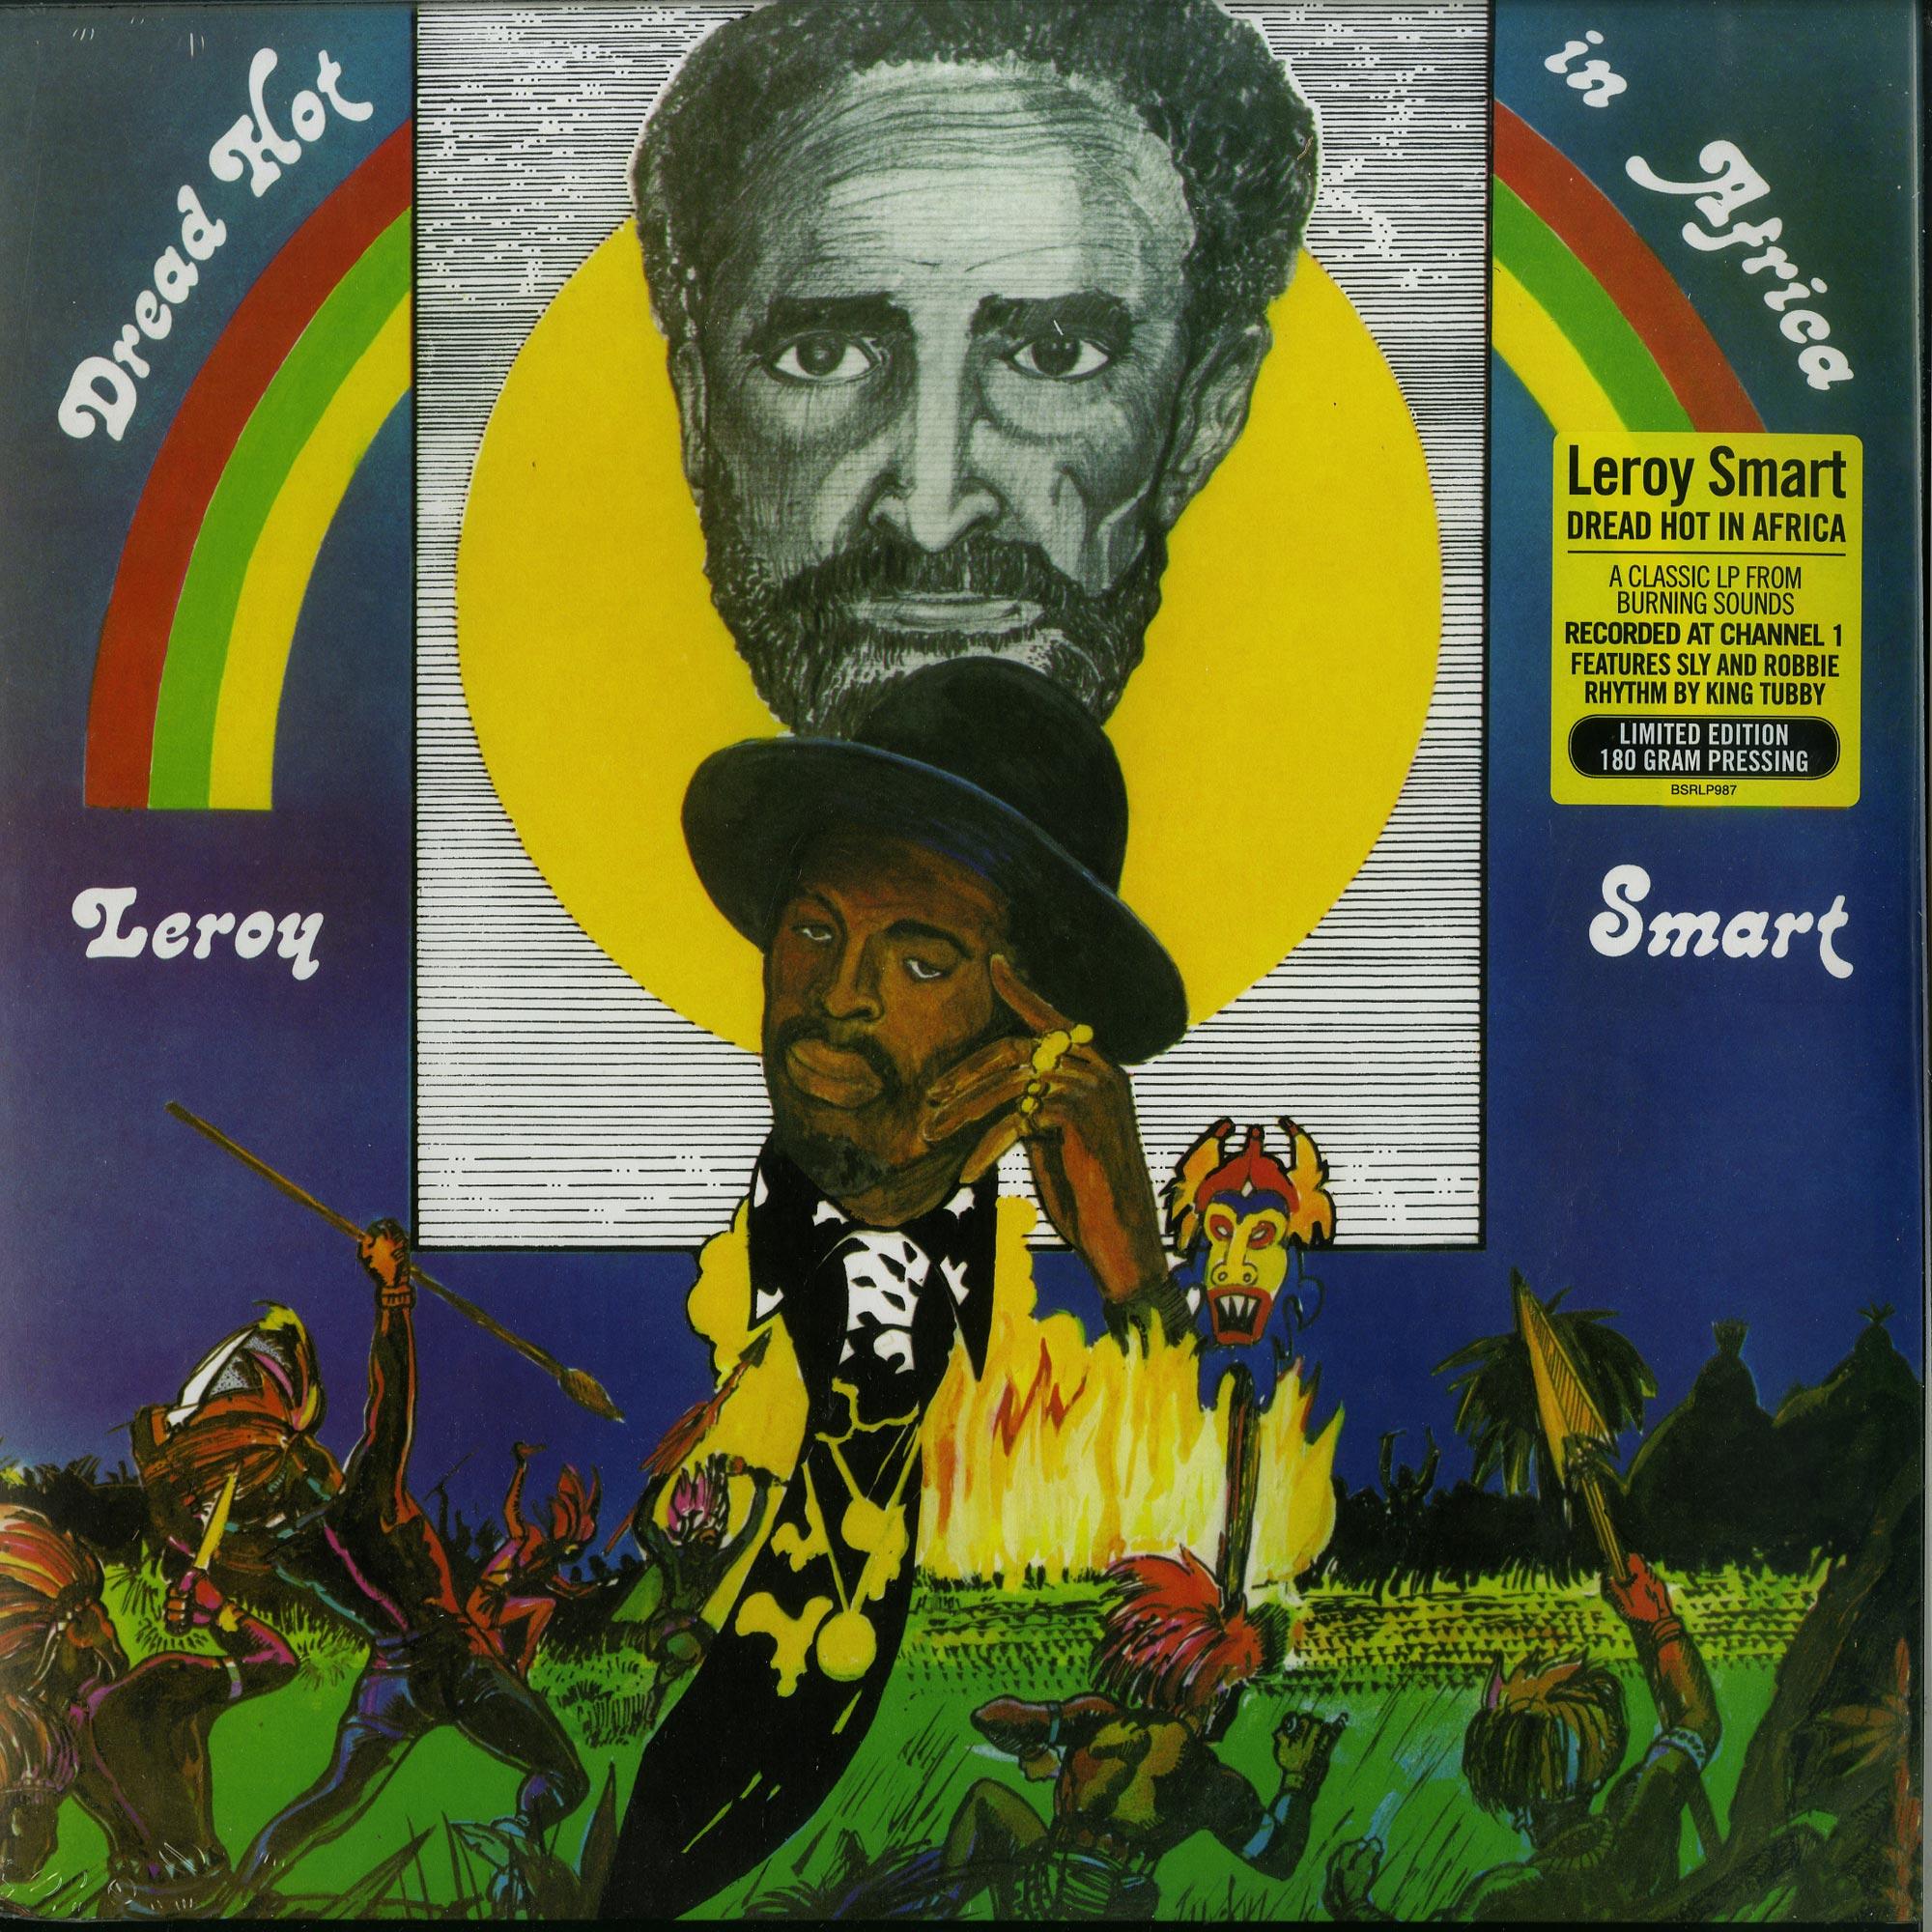 Leroy Smart - DREAD HOT IN AFRICA